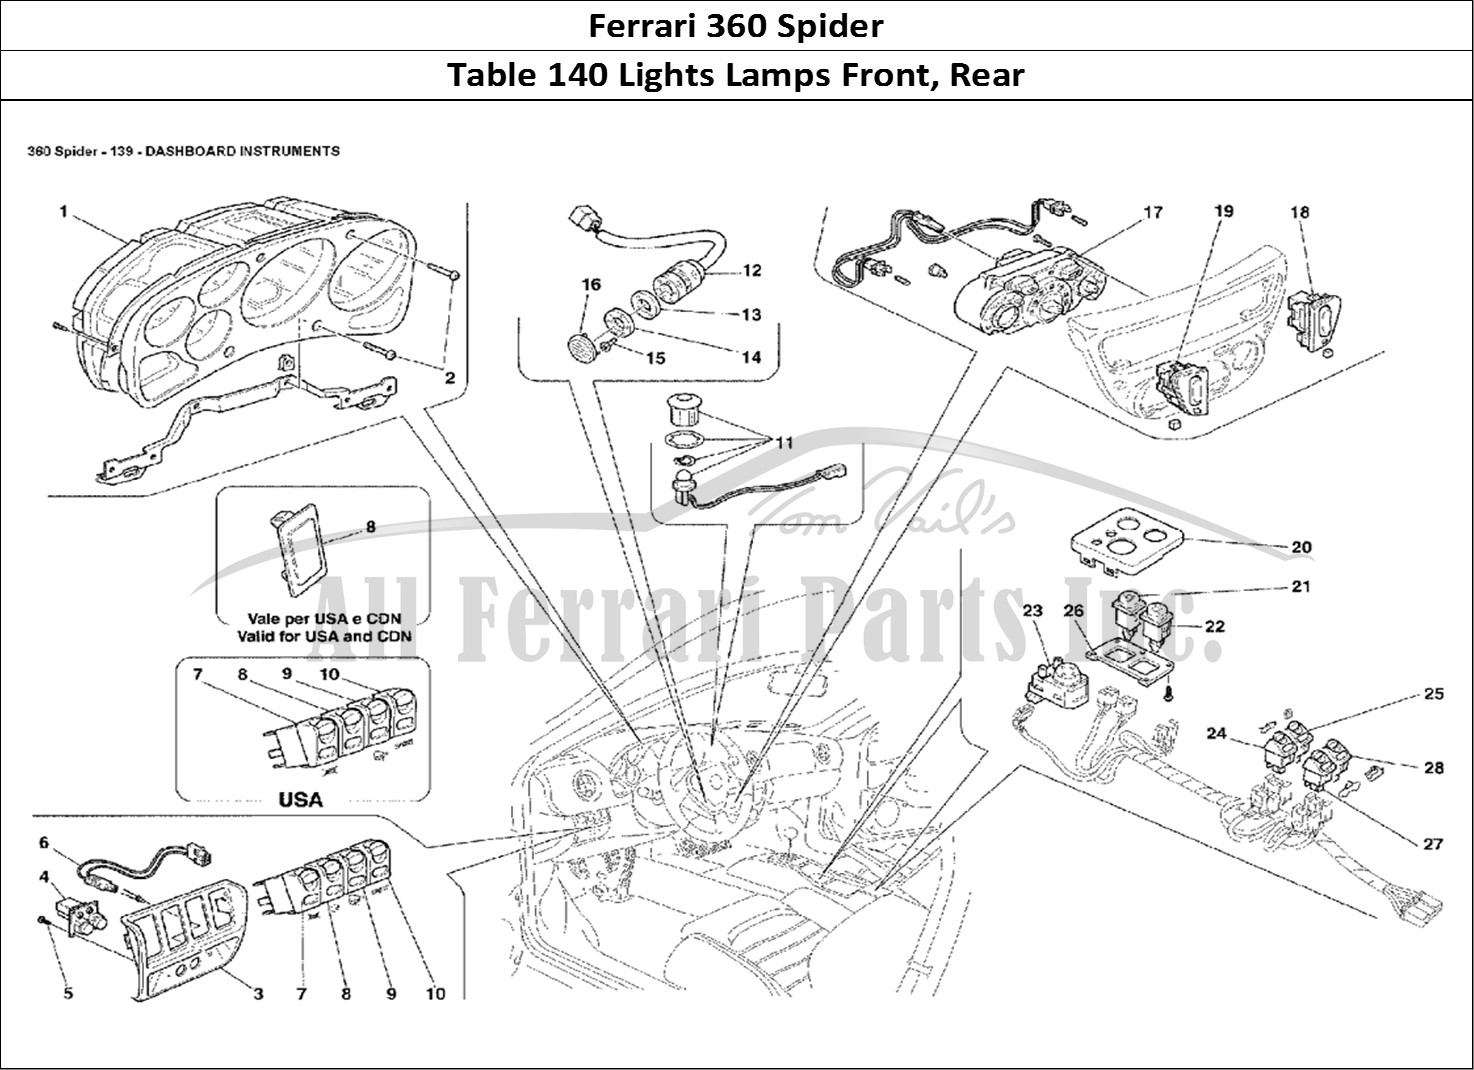 buy original ferrari 360 spider 140 lights lamps front  rear ferrari parts  spares  accessories